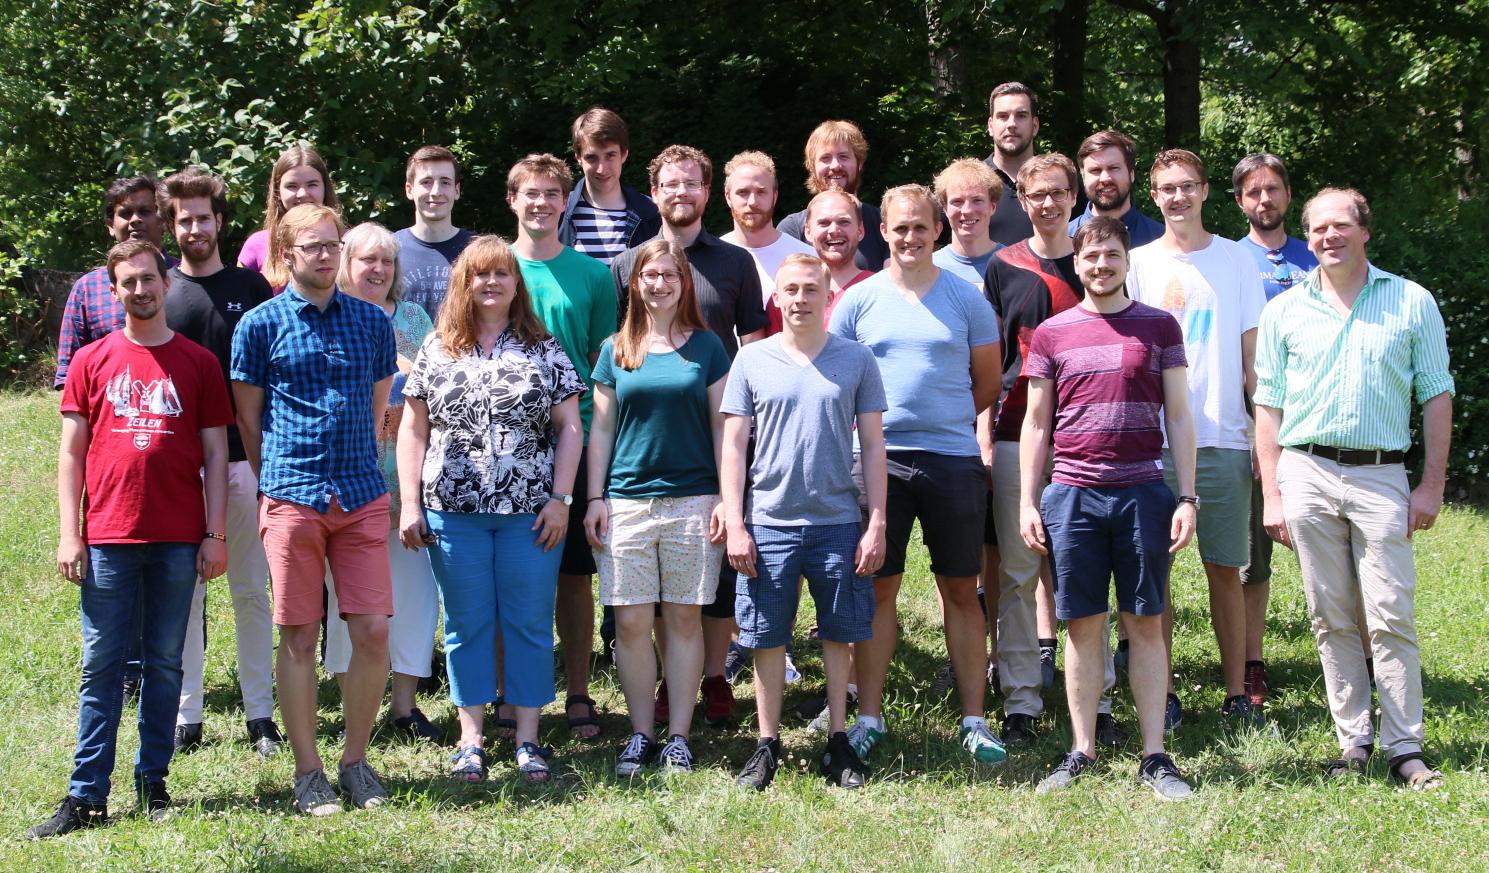 https://www.quantenbit.physik.uni-mainz.de/files/2018/06/Gruppenfoto.jpg